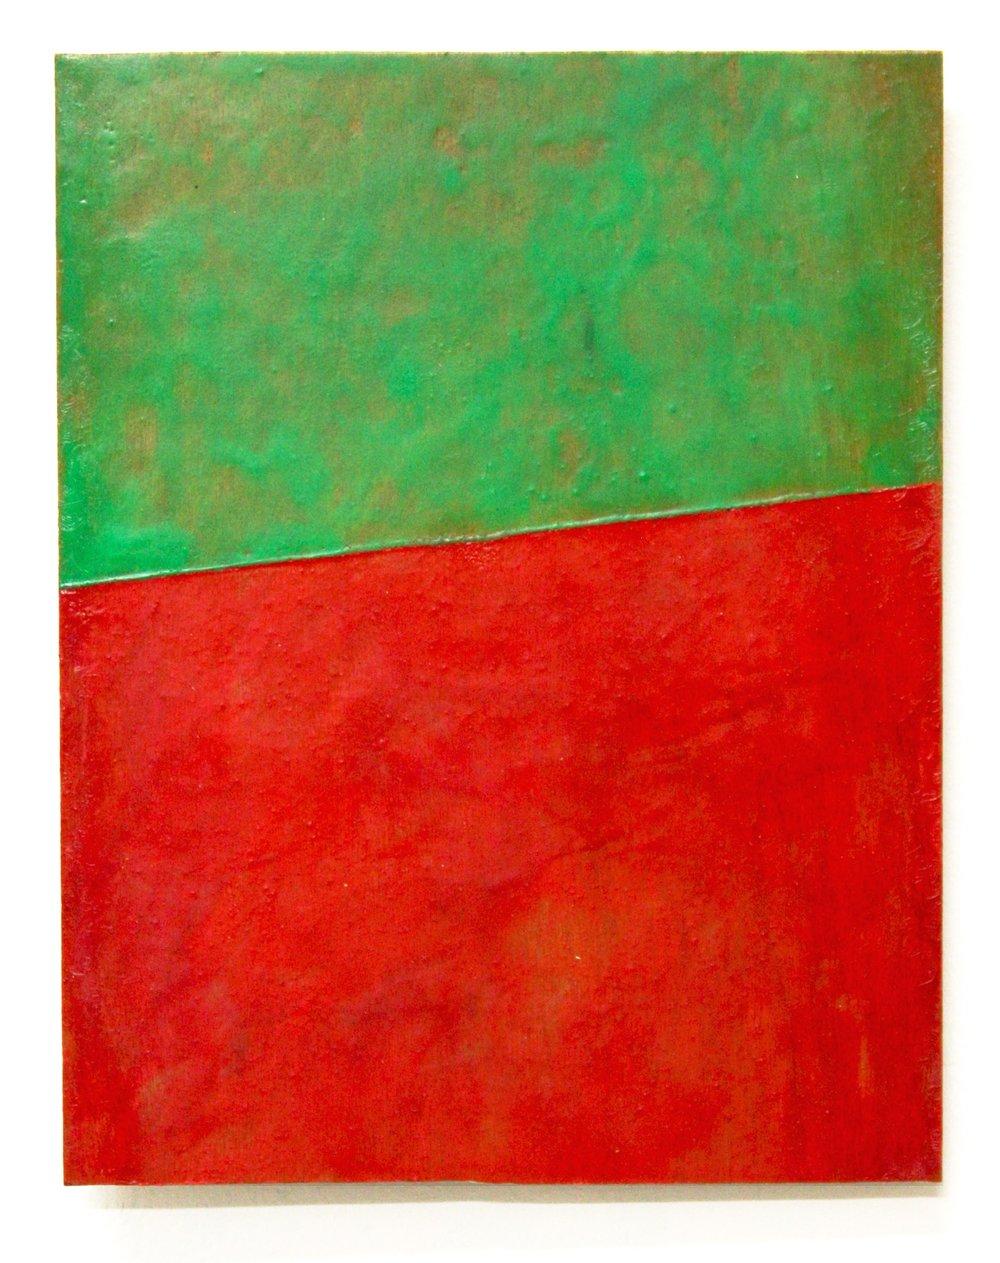 Untitled (Blinky Palermo series) , 2014   encaustic on plywood  27 x 21 cm  £800  [Ref. GK2]